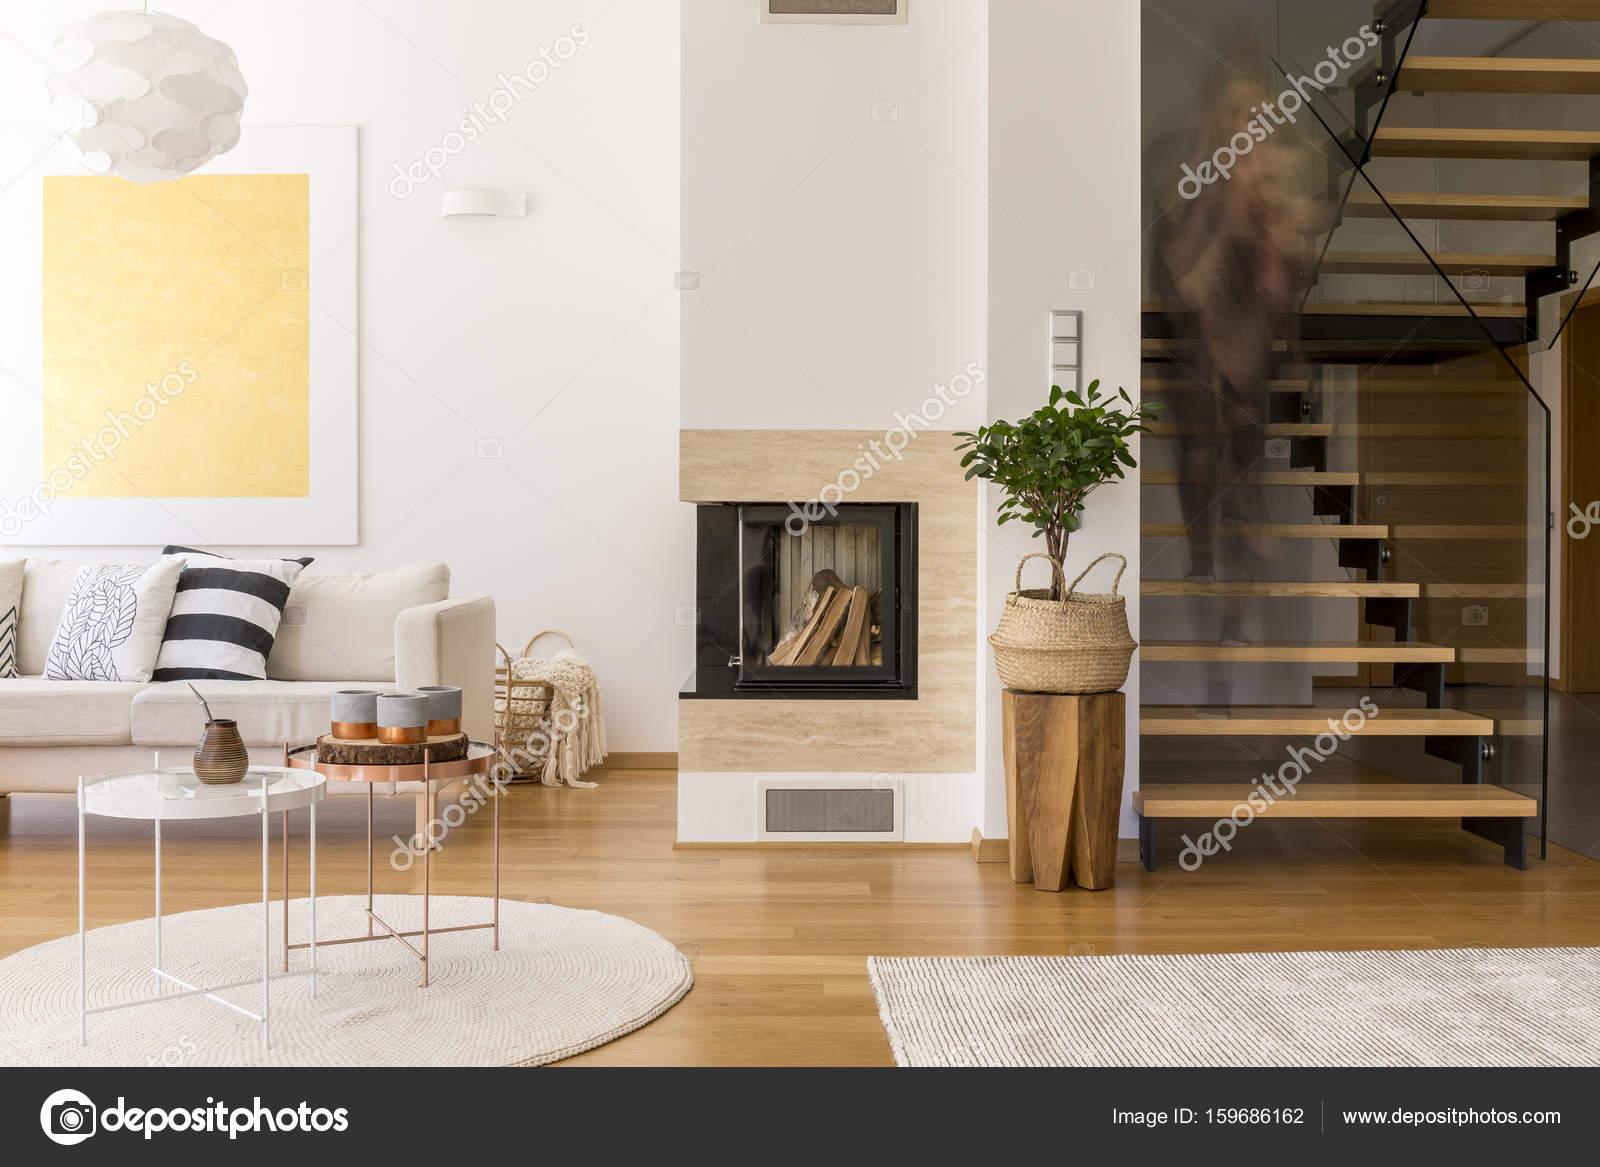 Houten design lounge u2014 stockfoto © photographee.eu #159686162